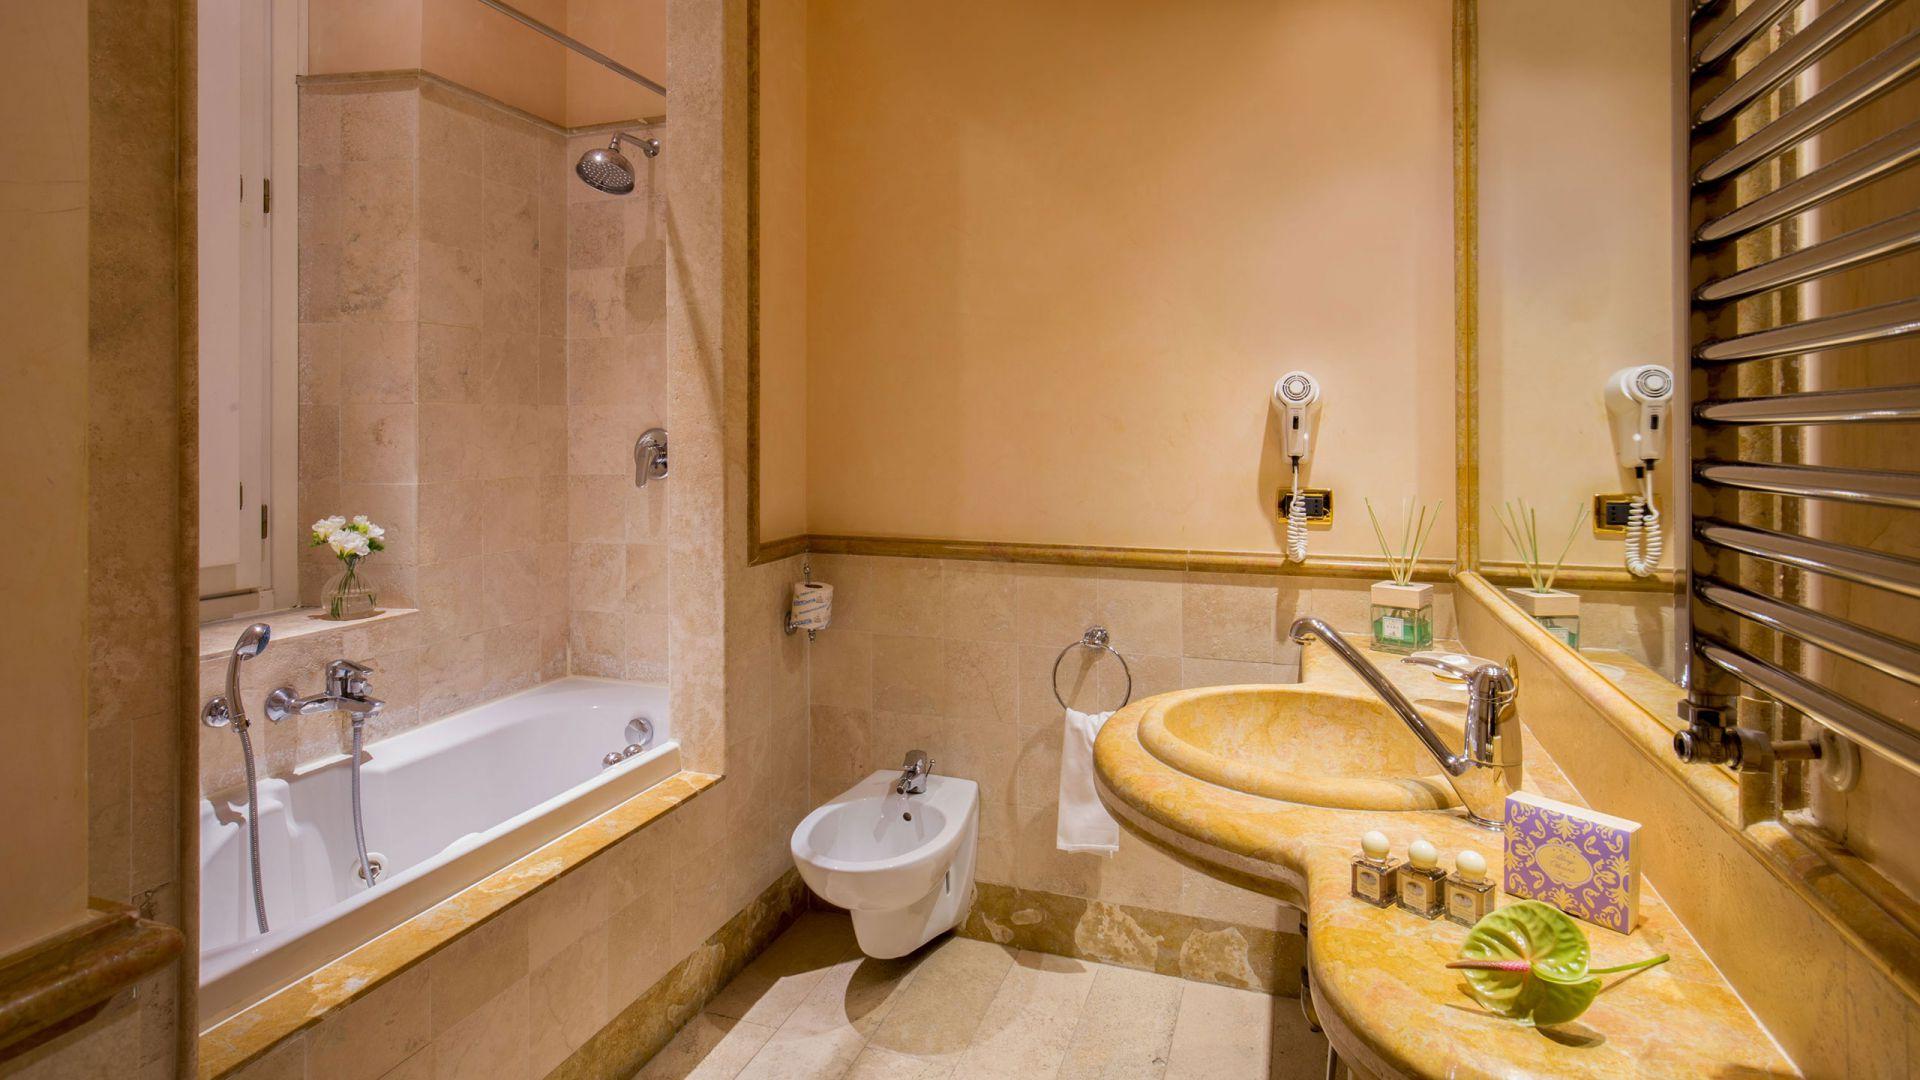 albergo-ottocento-rome-salle-de-bain-15